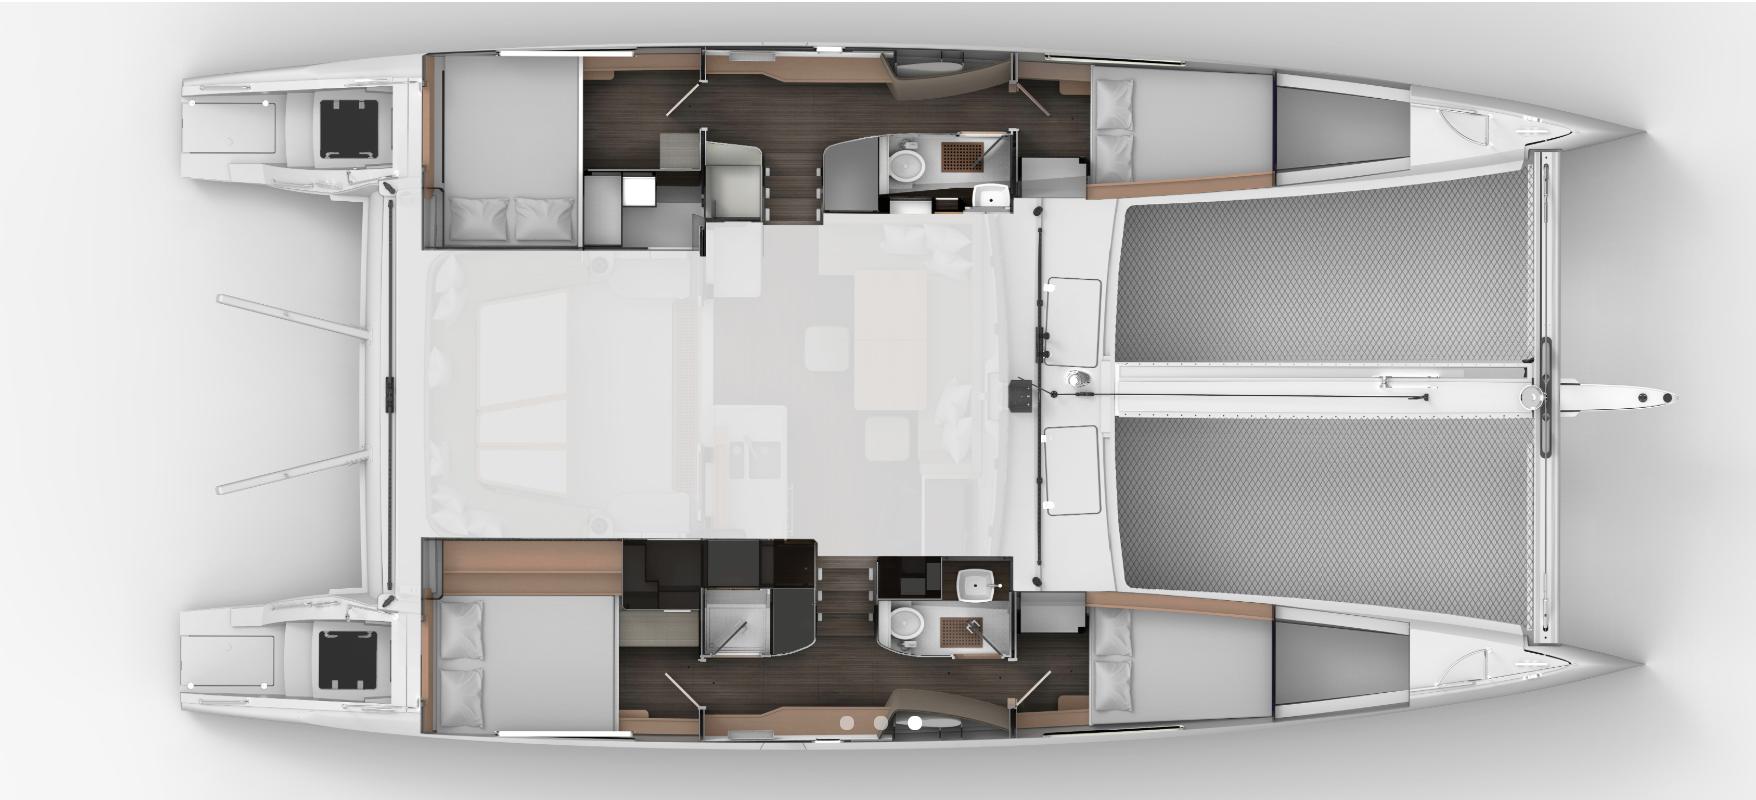 Outremer 51 catamaran layout 2.png